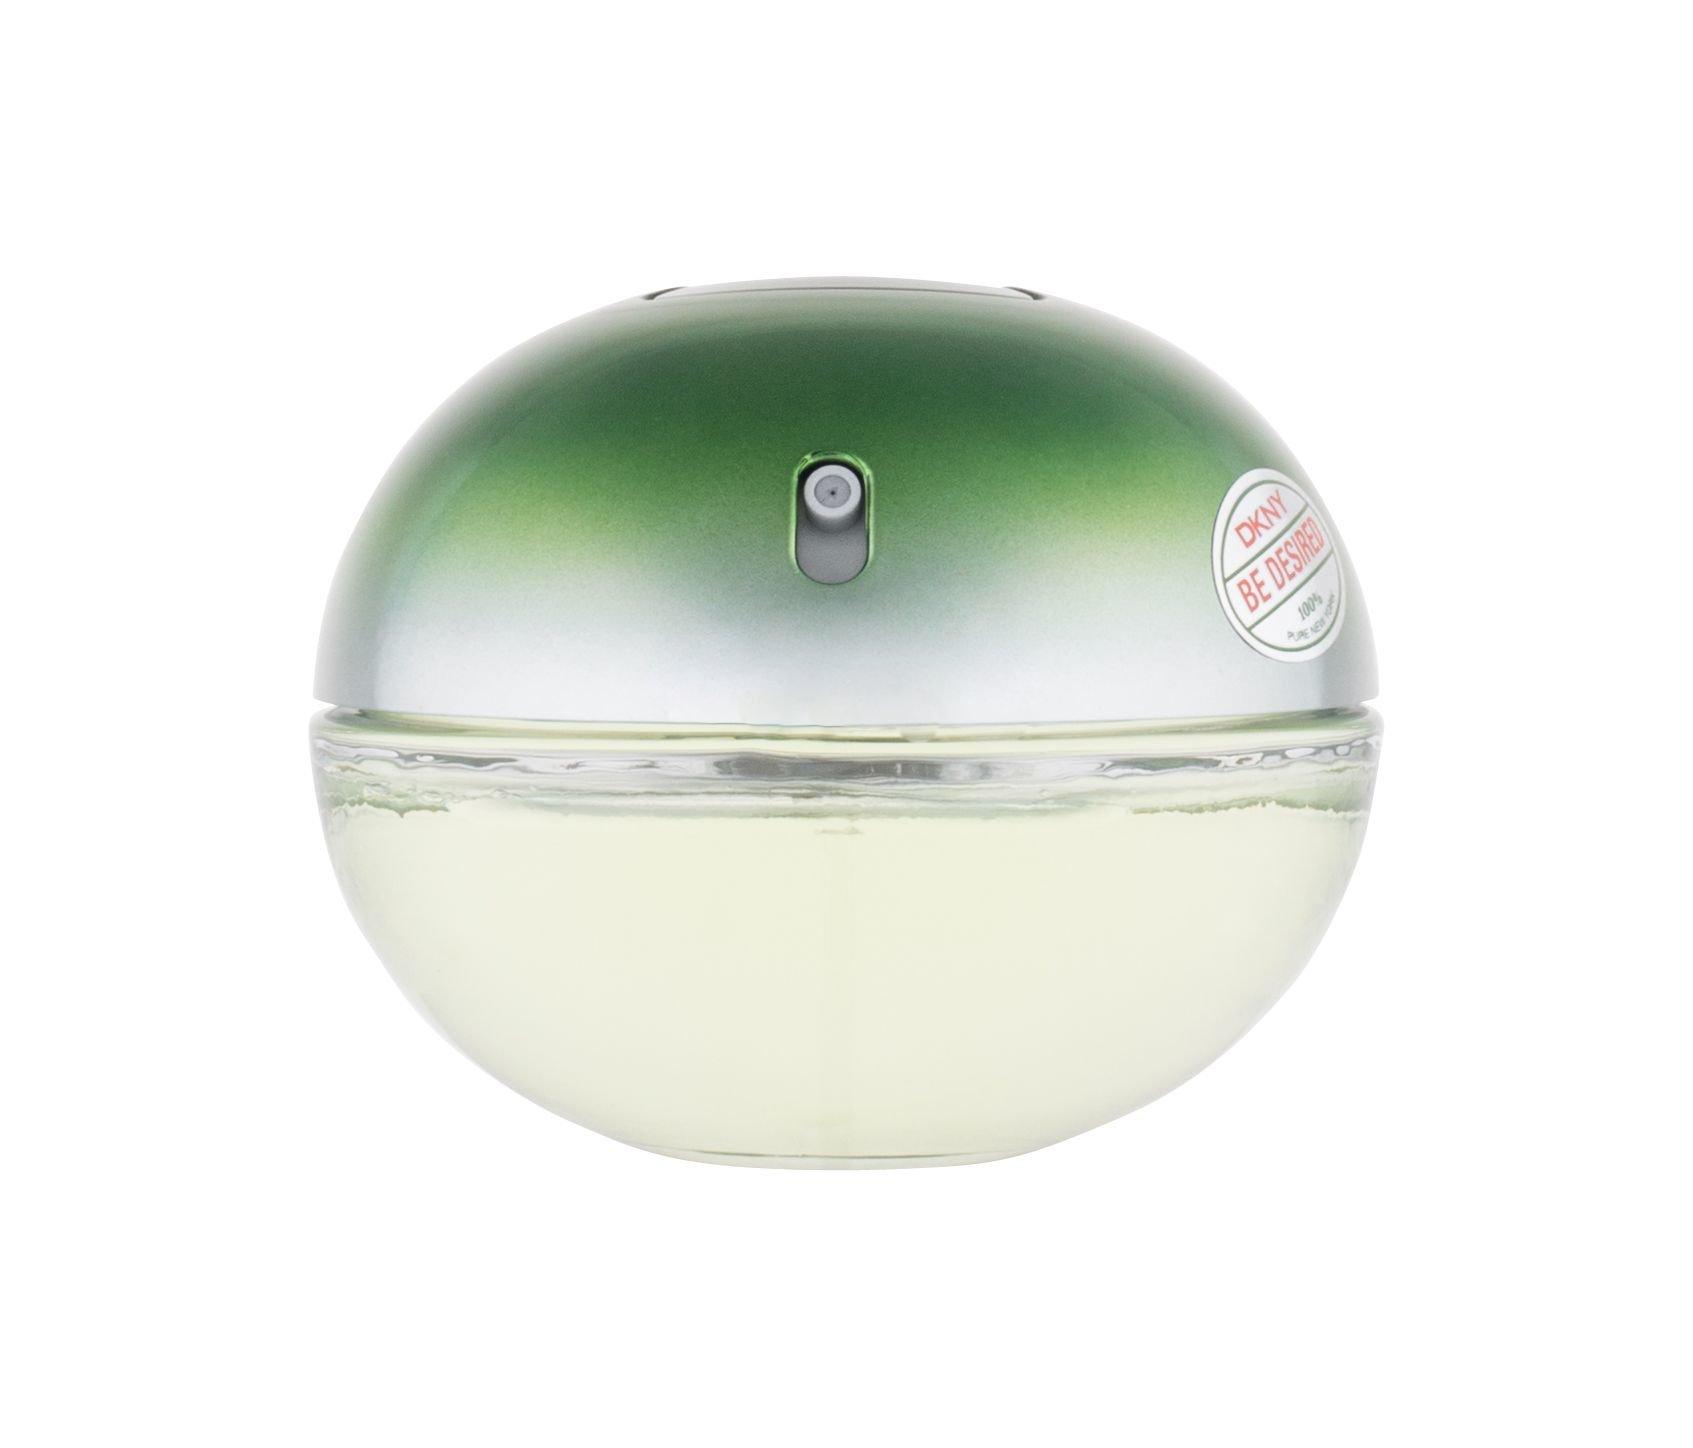 DKNY DKNY Be Desired Eau de Parfum 50ml